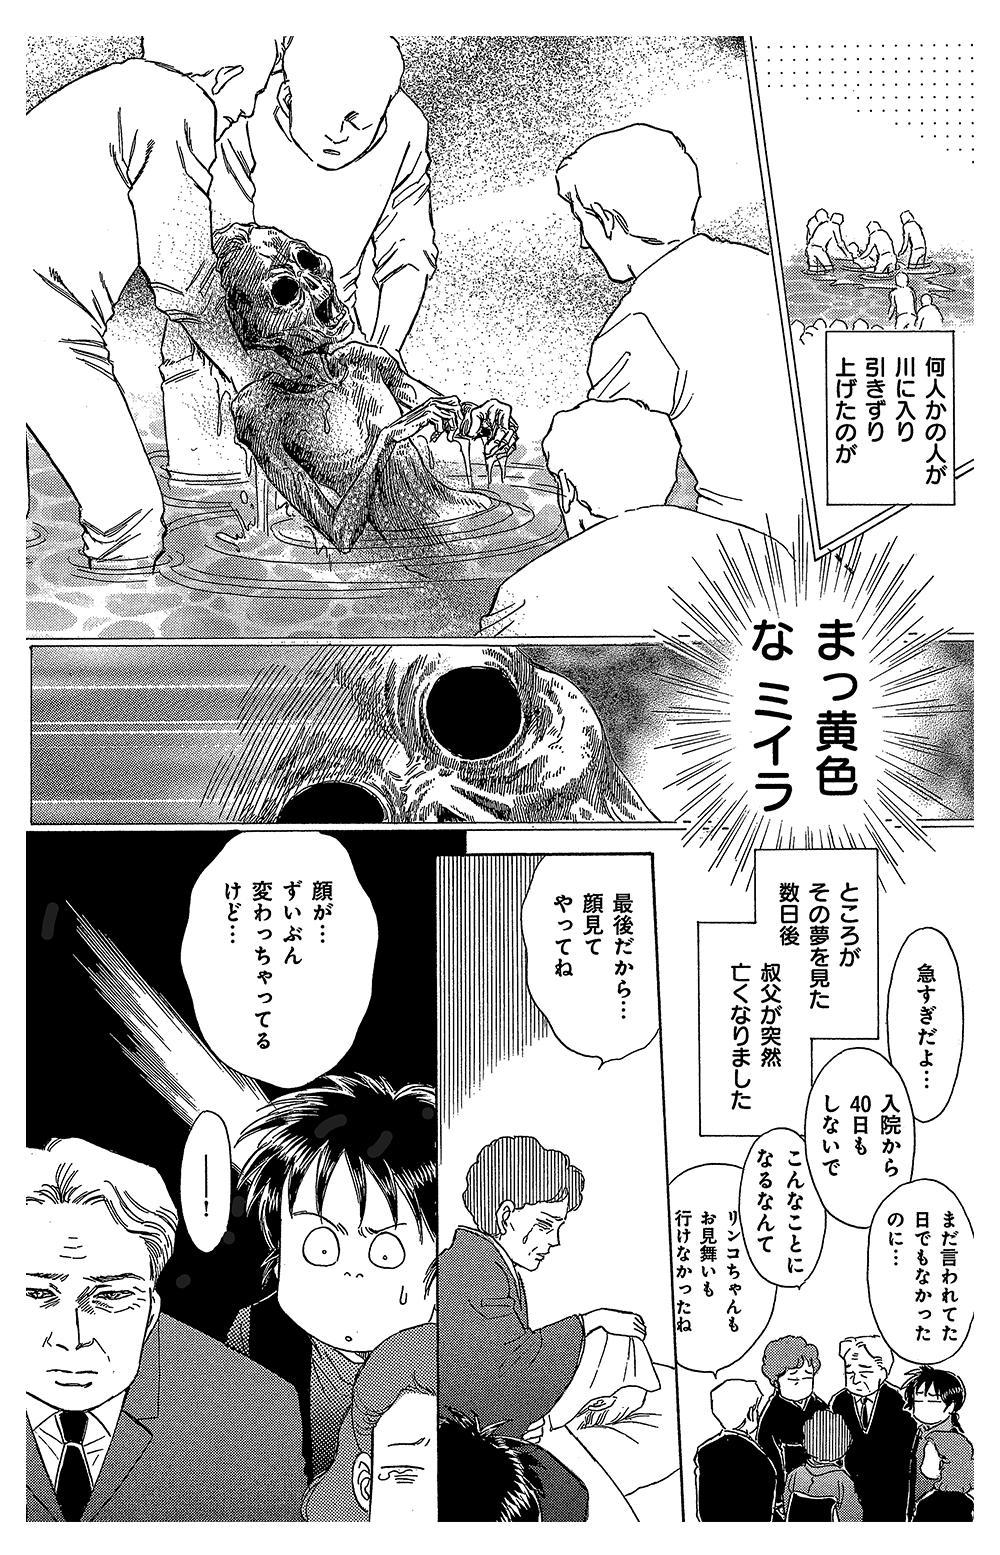 okaruto2-1-10.jpg